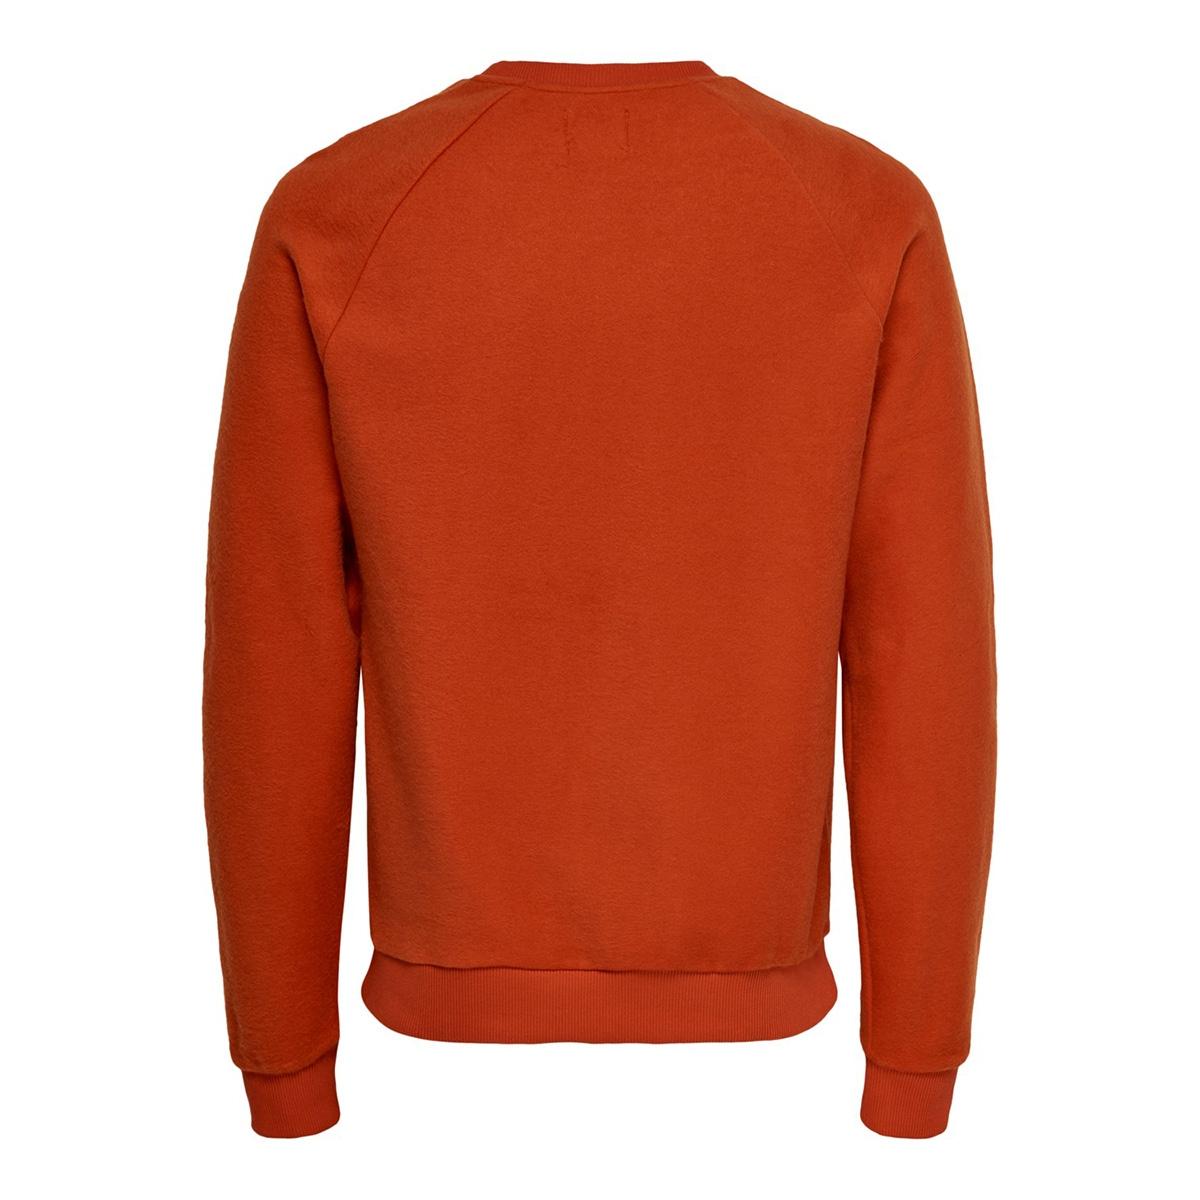 onsmspencer reg raglan crewneck swe 22014900 only & sons sweater rooibos tea